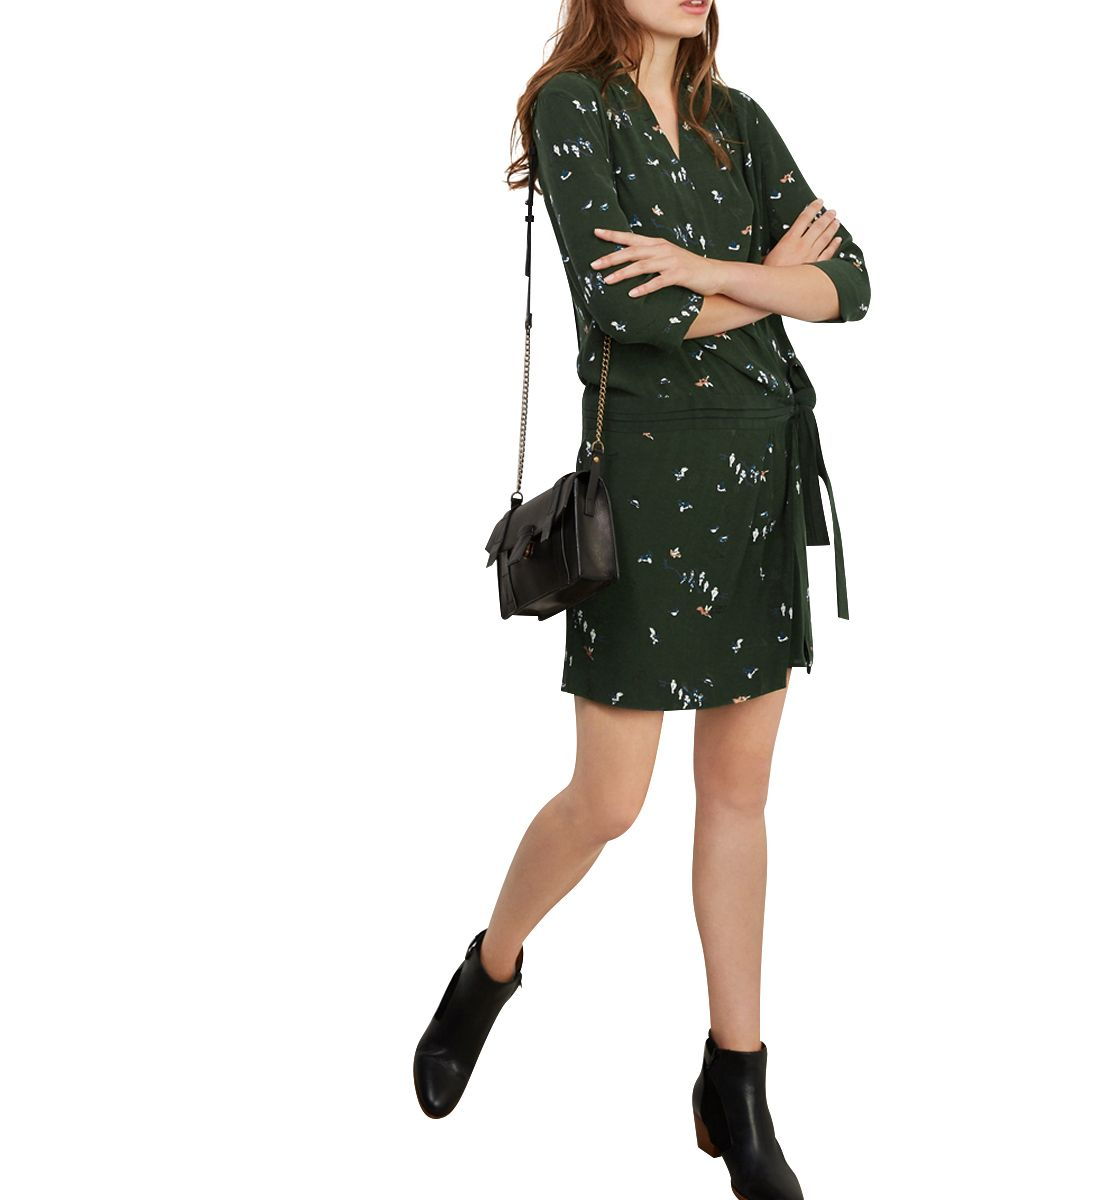 eb64f6611cf0c Robe Bigup   Mode - Robe   Pinterest